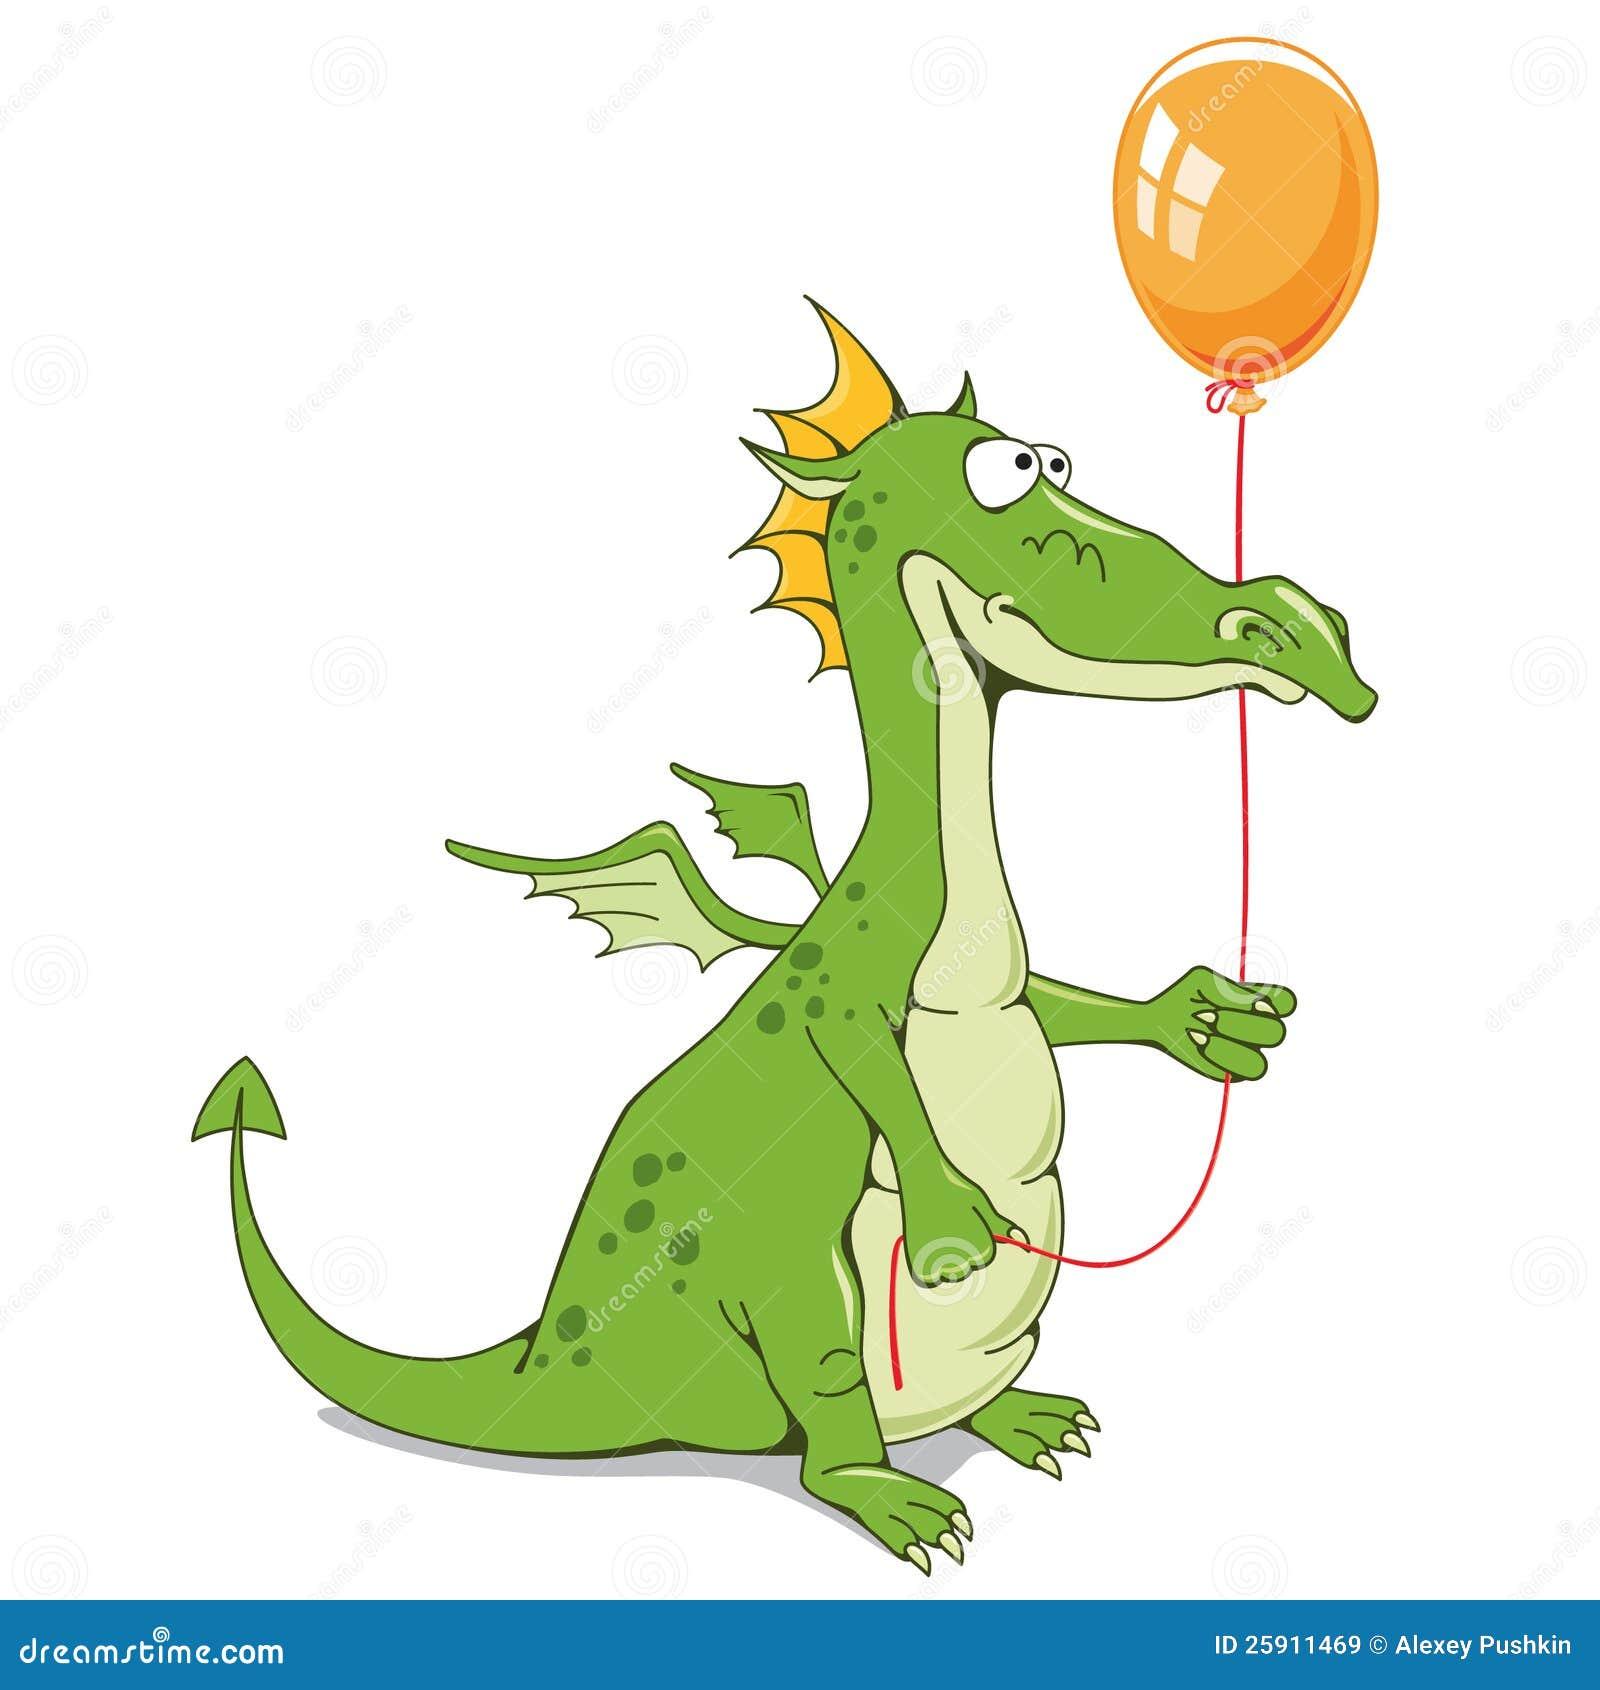 Dragon Balloon Animal